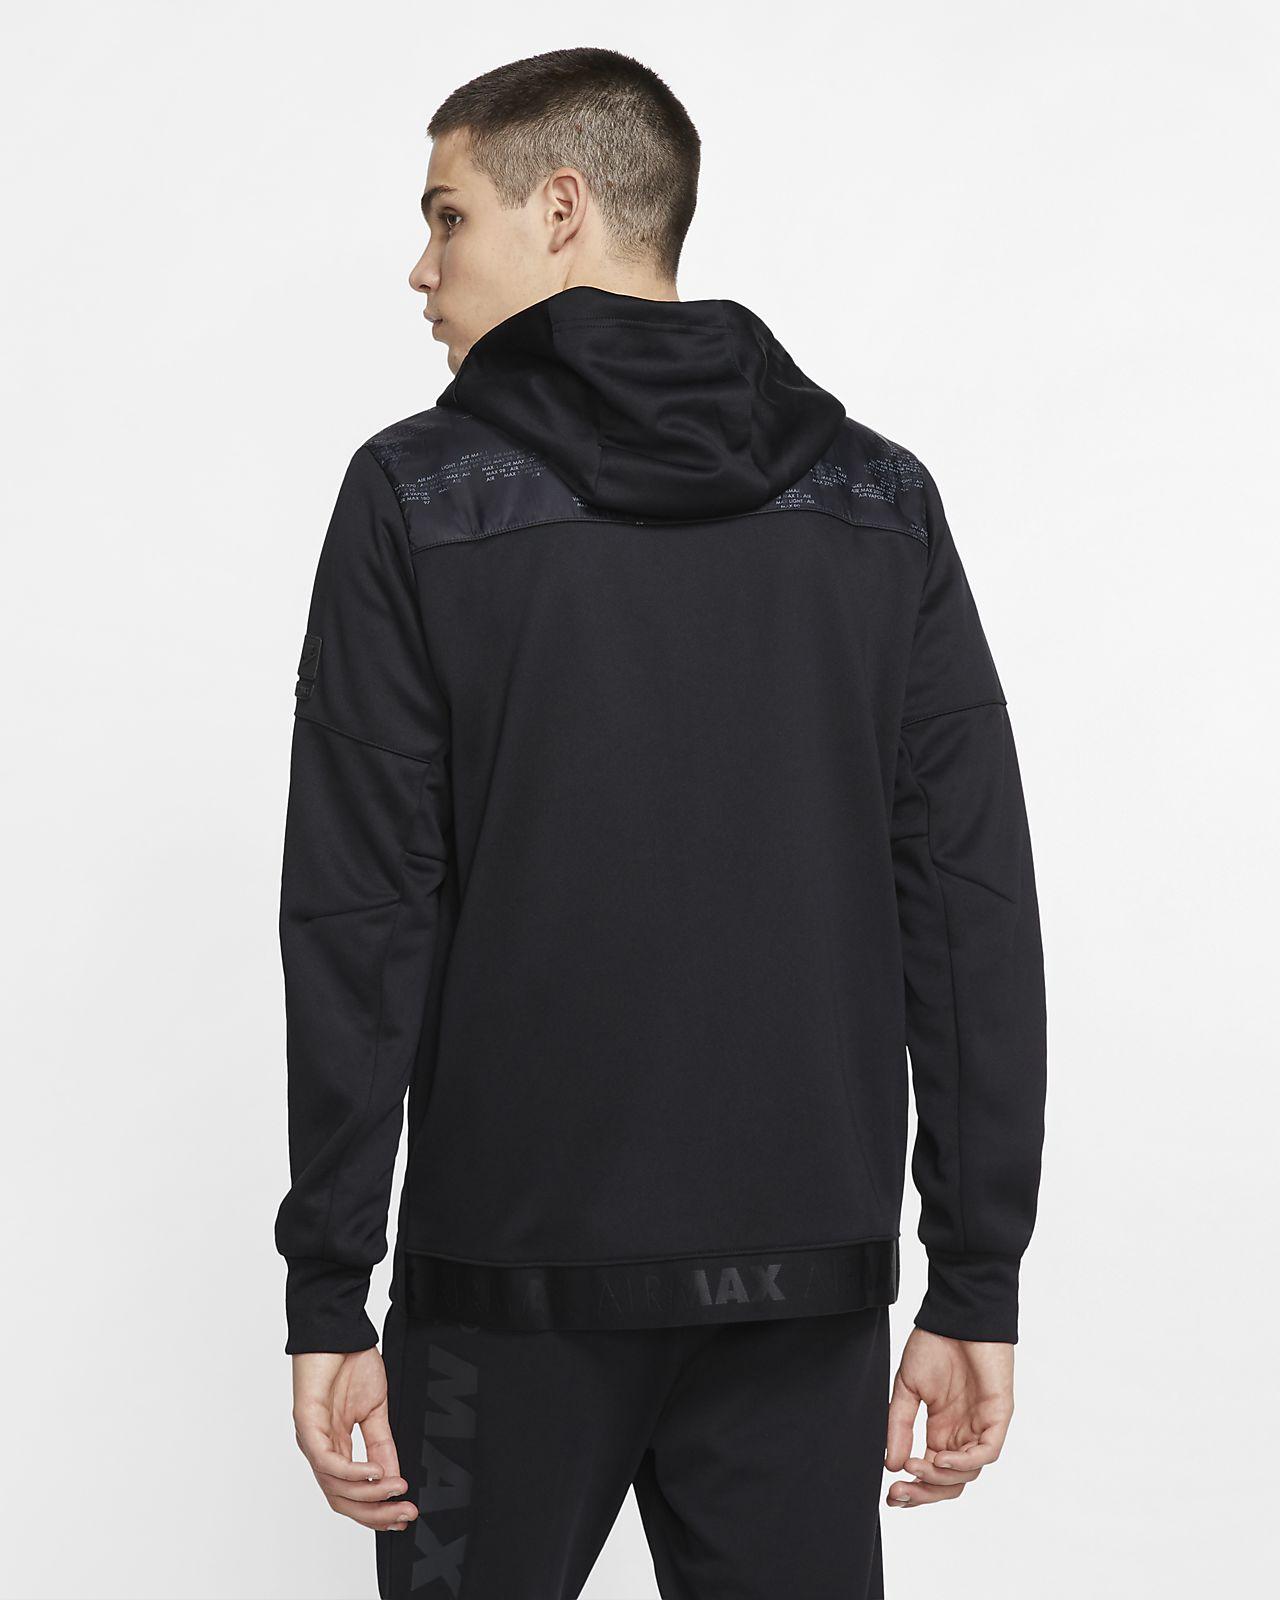 b14b92a0fb03 Nike Sportswear Men s Full-Zip Hoodie. Nike.com AU